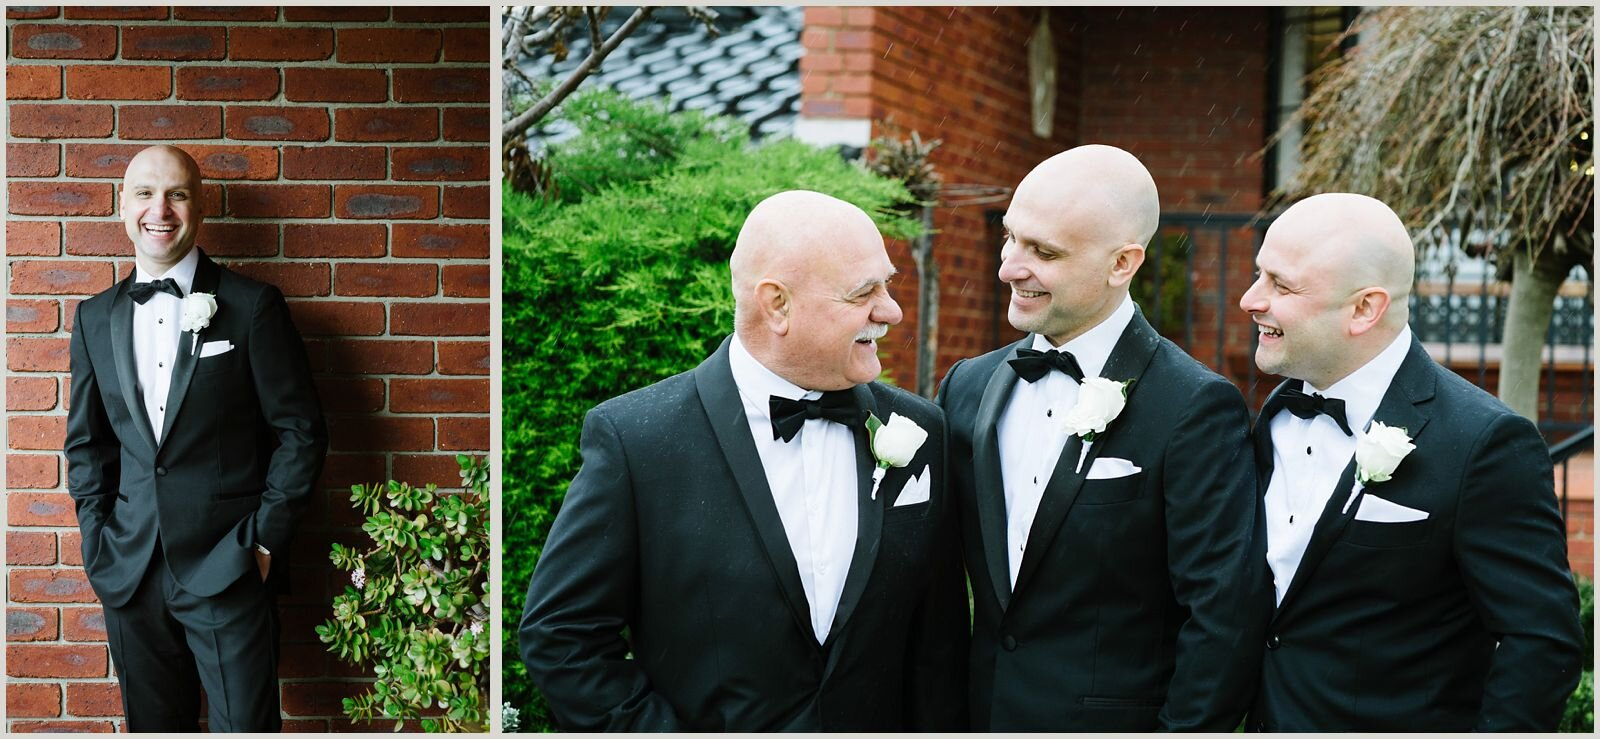 joseph_koprek_wedding_melbourne_the_prince_deck_0007.jpg